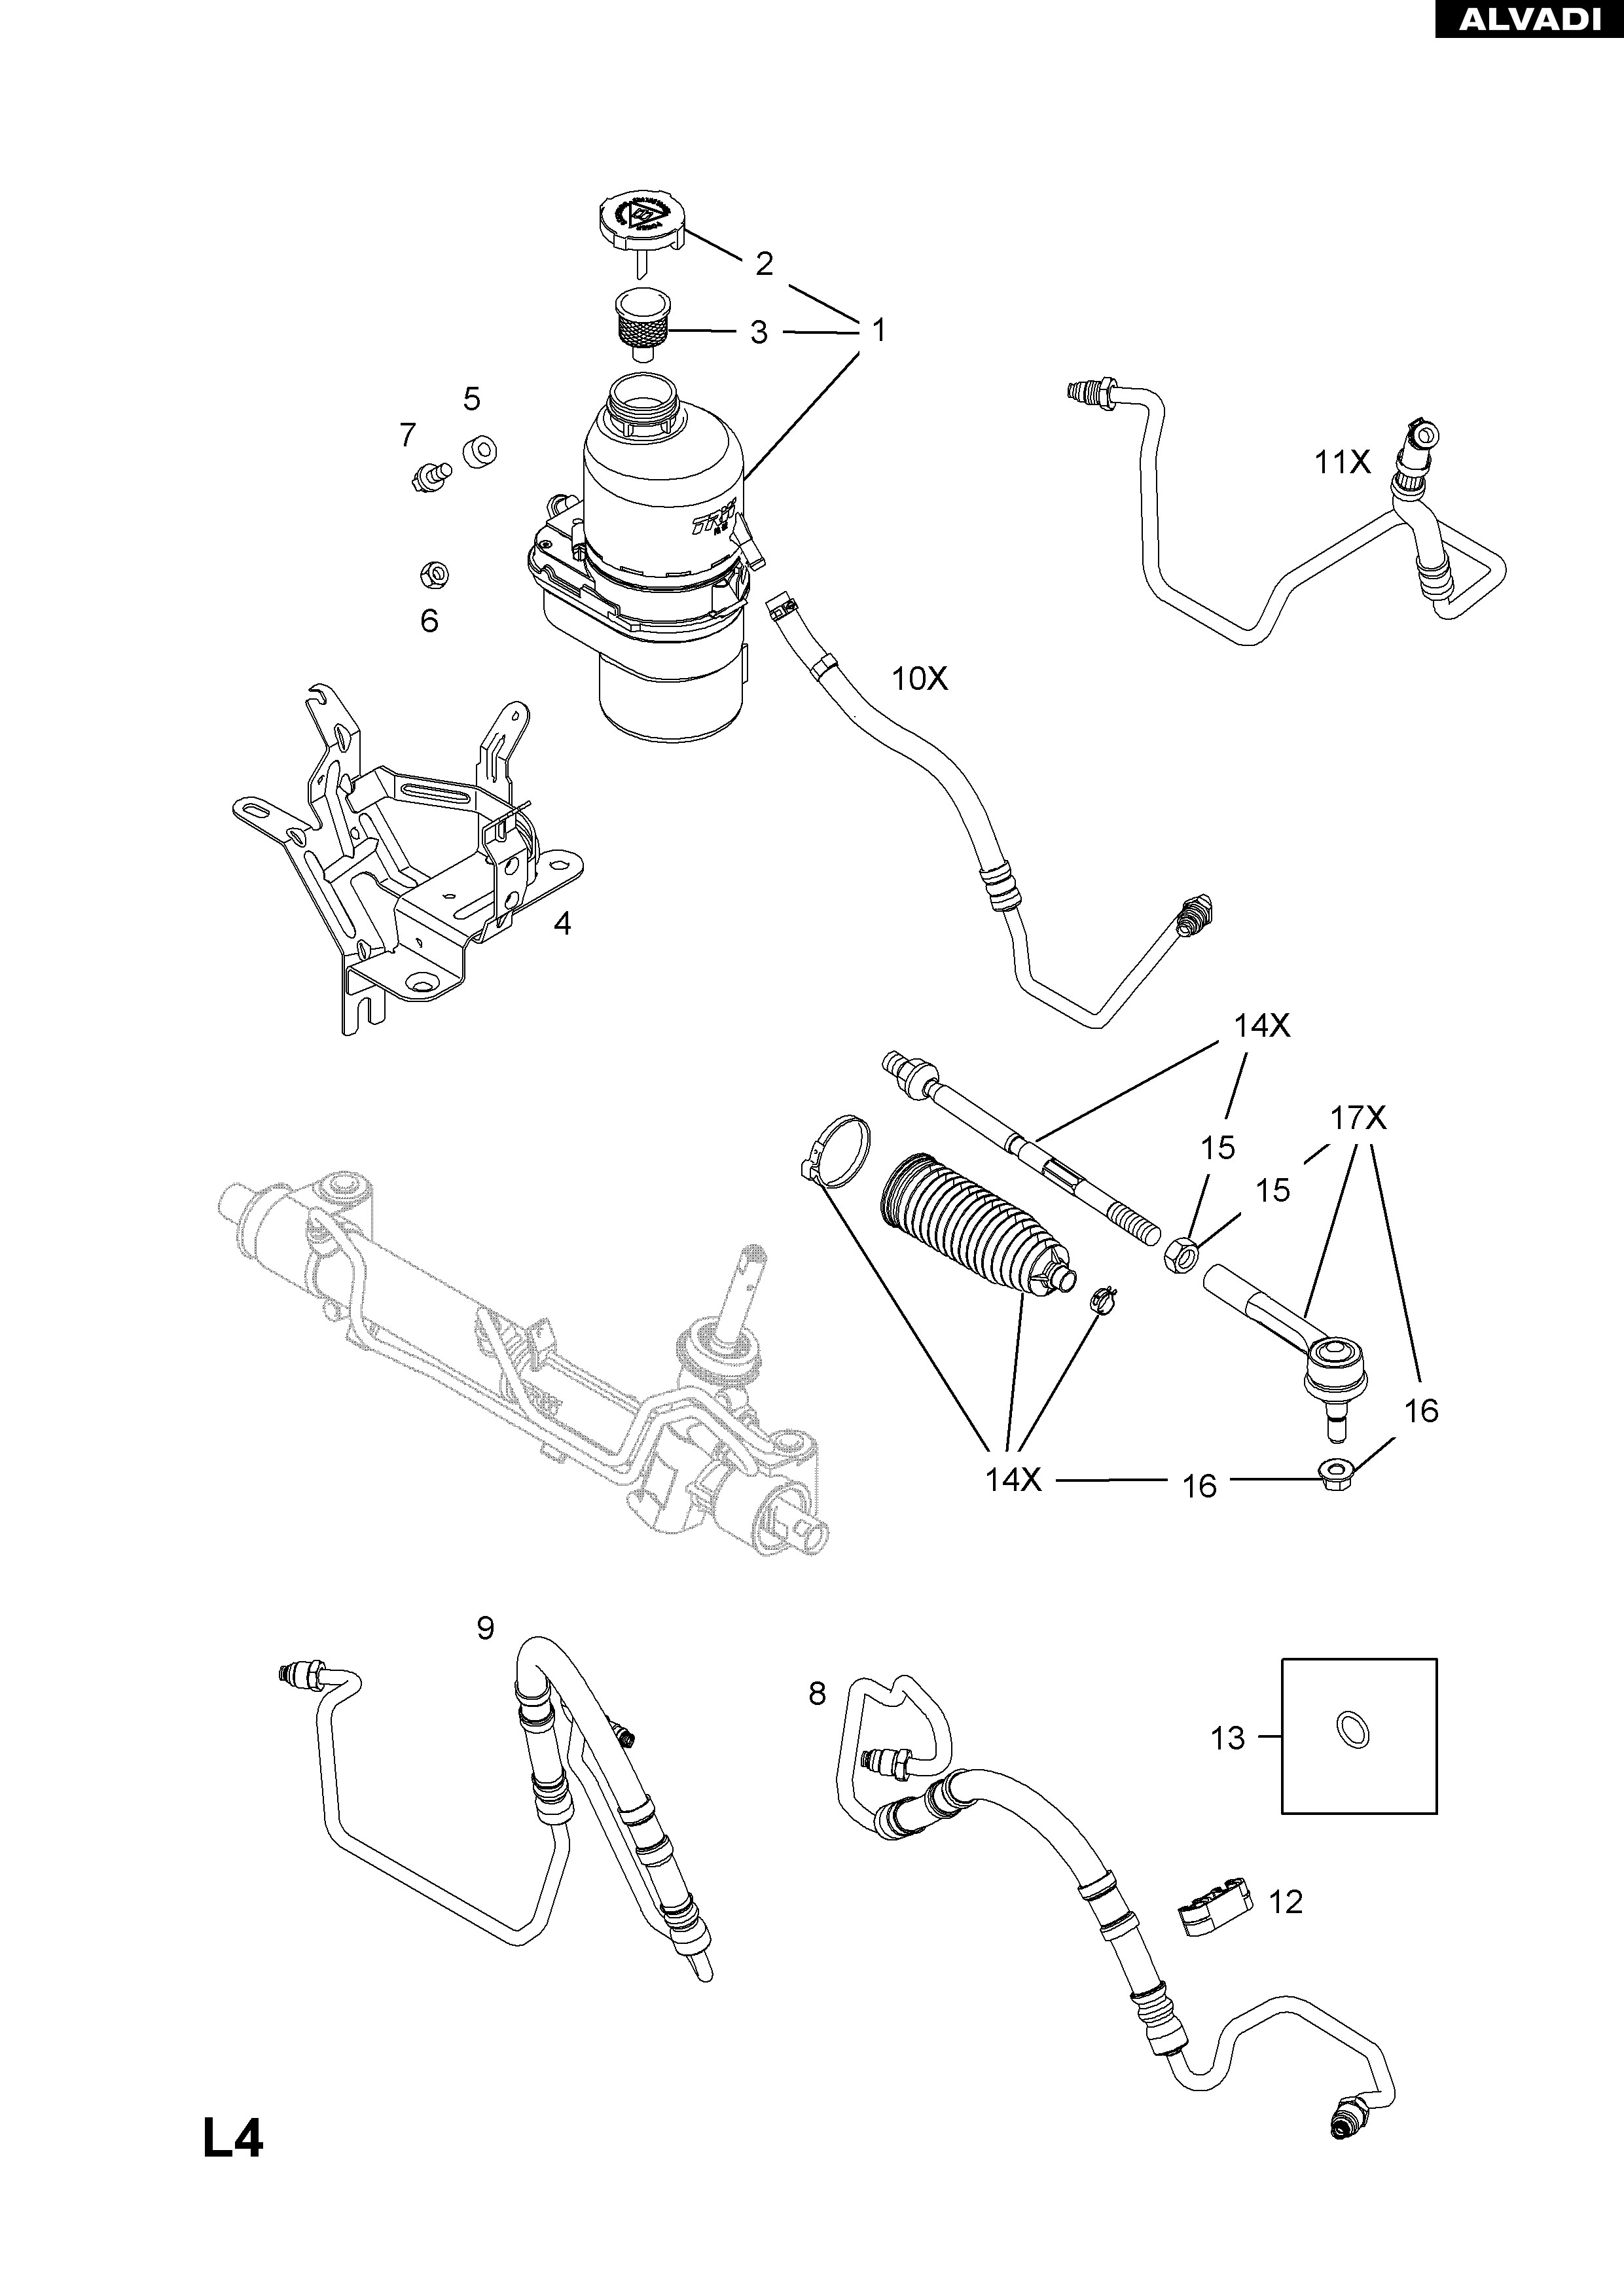 Power Steering assembly Diagram Opel Power Steering Hoses and Pipes Of Power Steering assembly Diagram